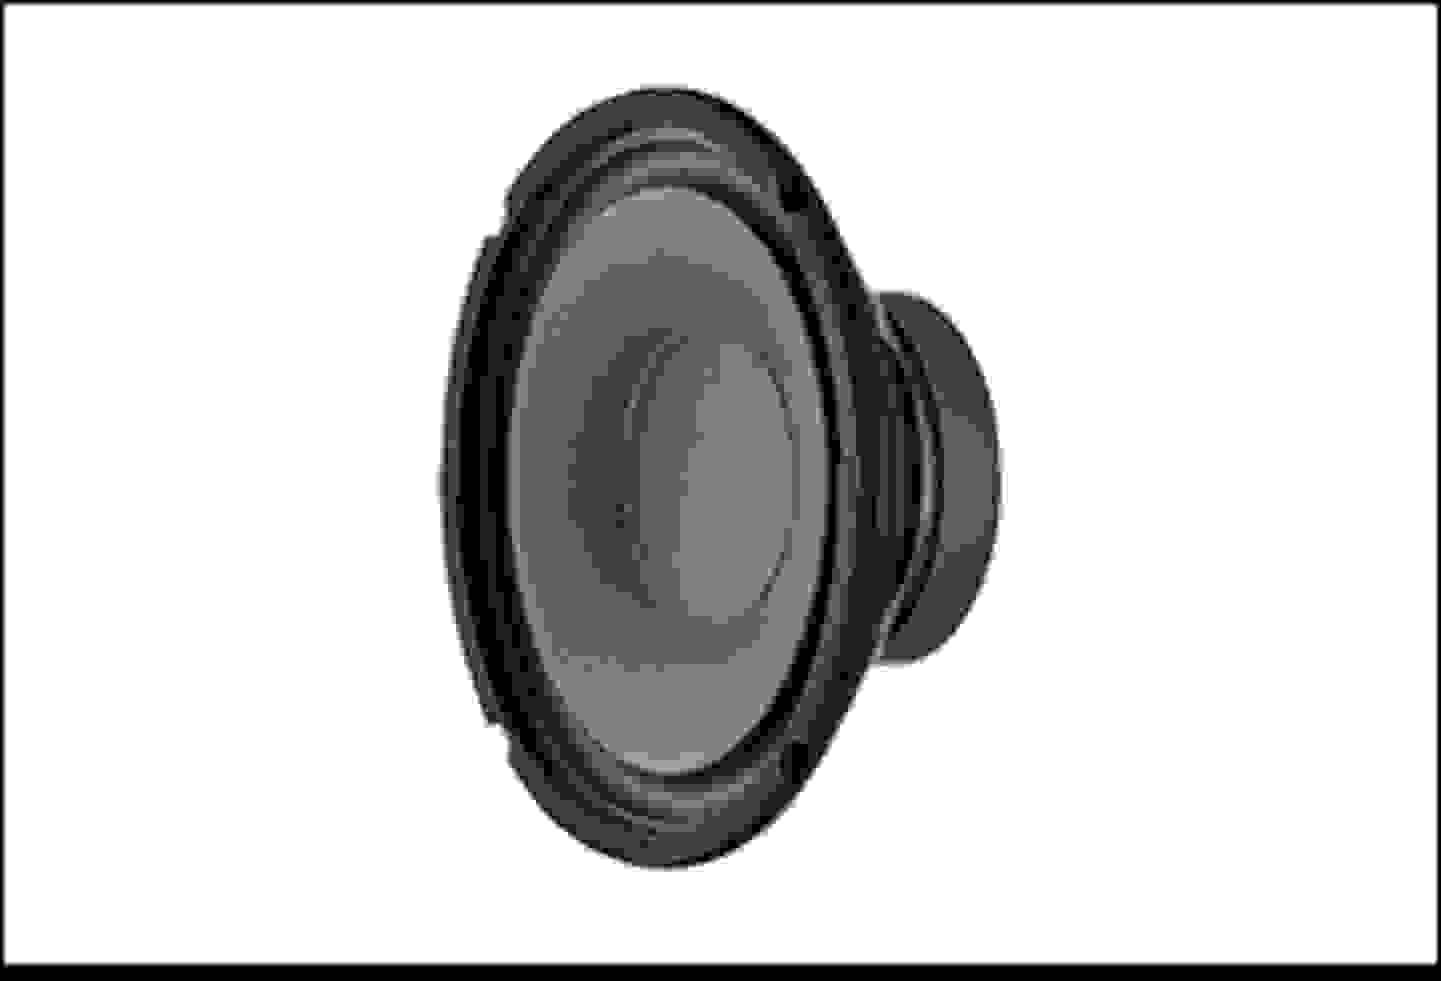 Speaka Professional - Haut-parleurs & mégaphones